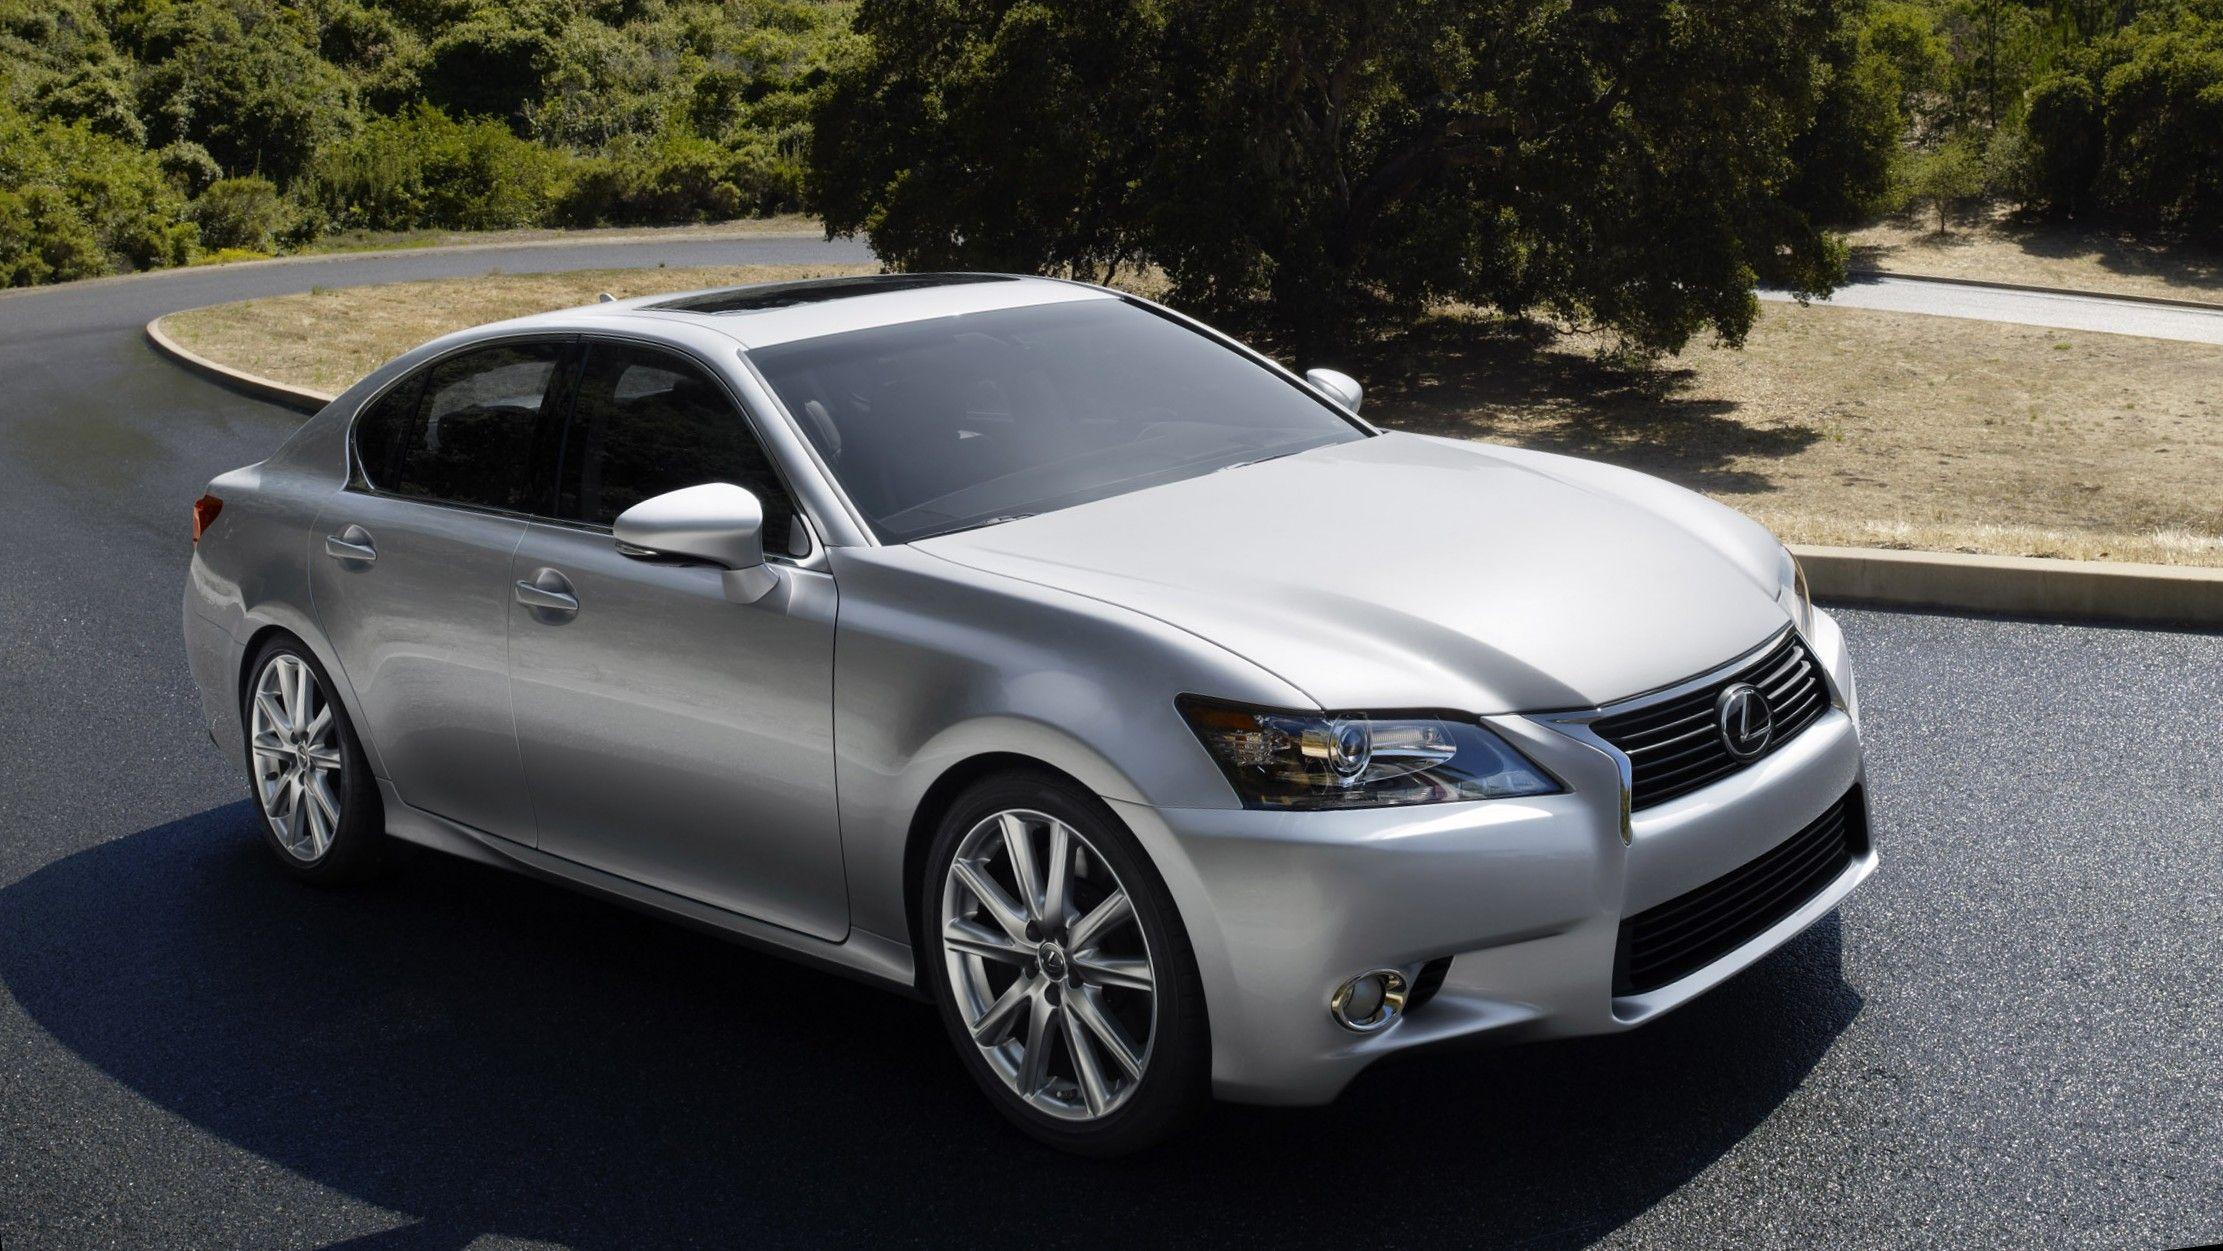 Lexus gs350 f sport cars pinterest cars lexus cars and luxury cars